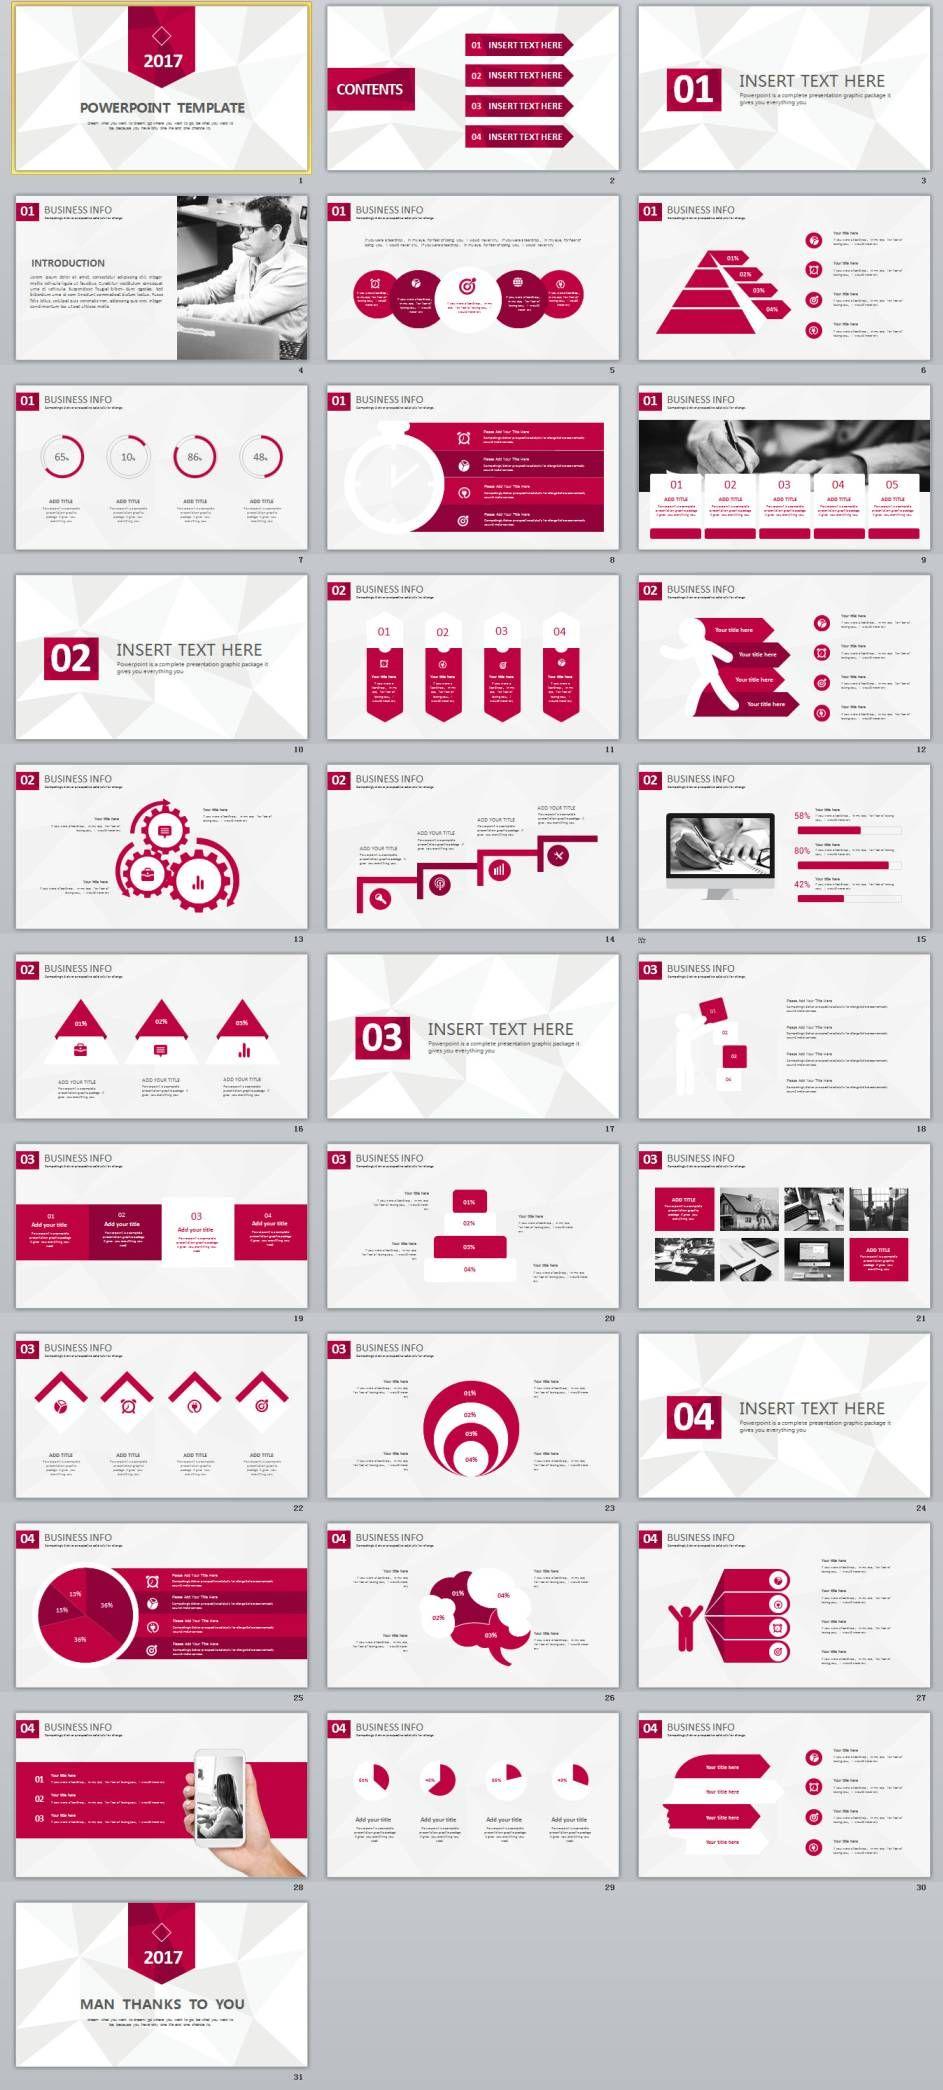 31 best business powerpoint template pinterest business 31 best business powerpoint template powerpoint templates and keynote templates fbccfo Choice Image